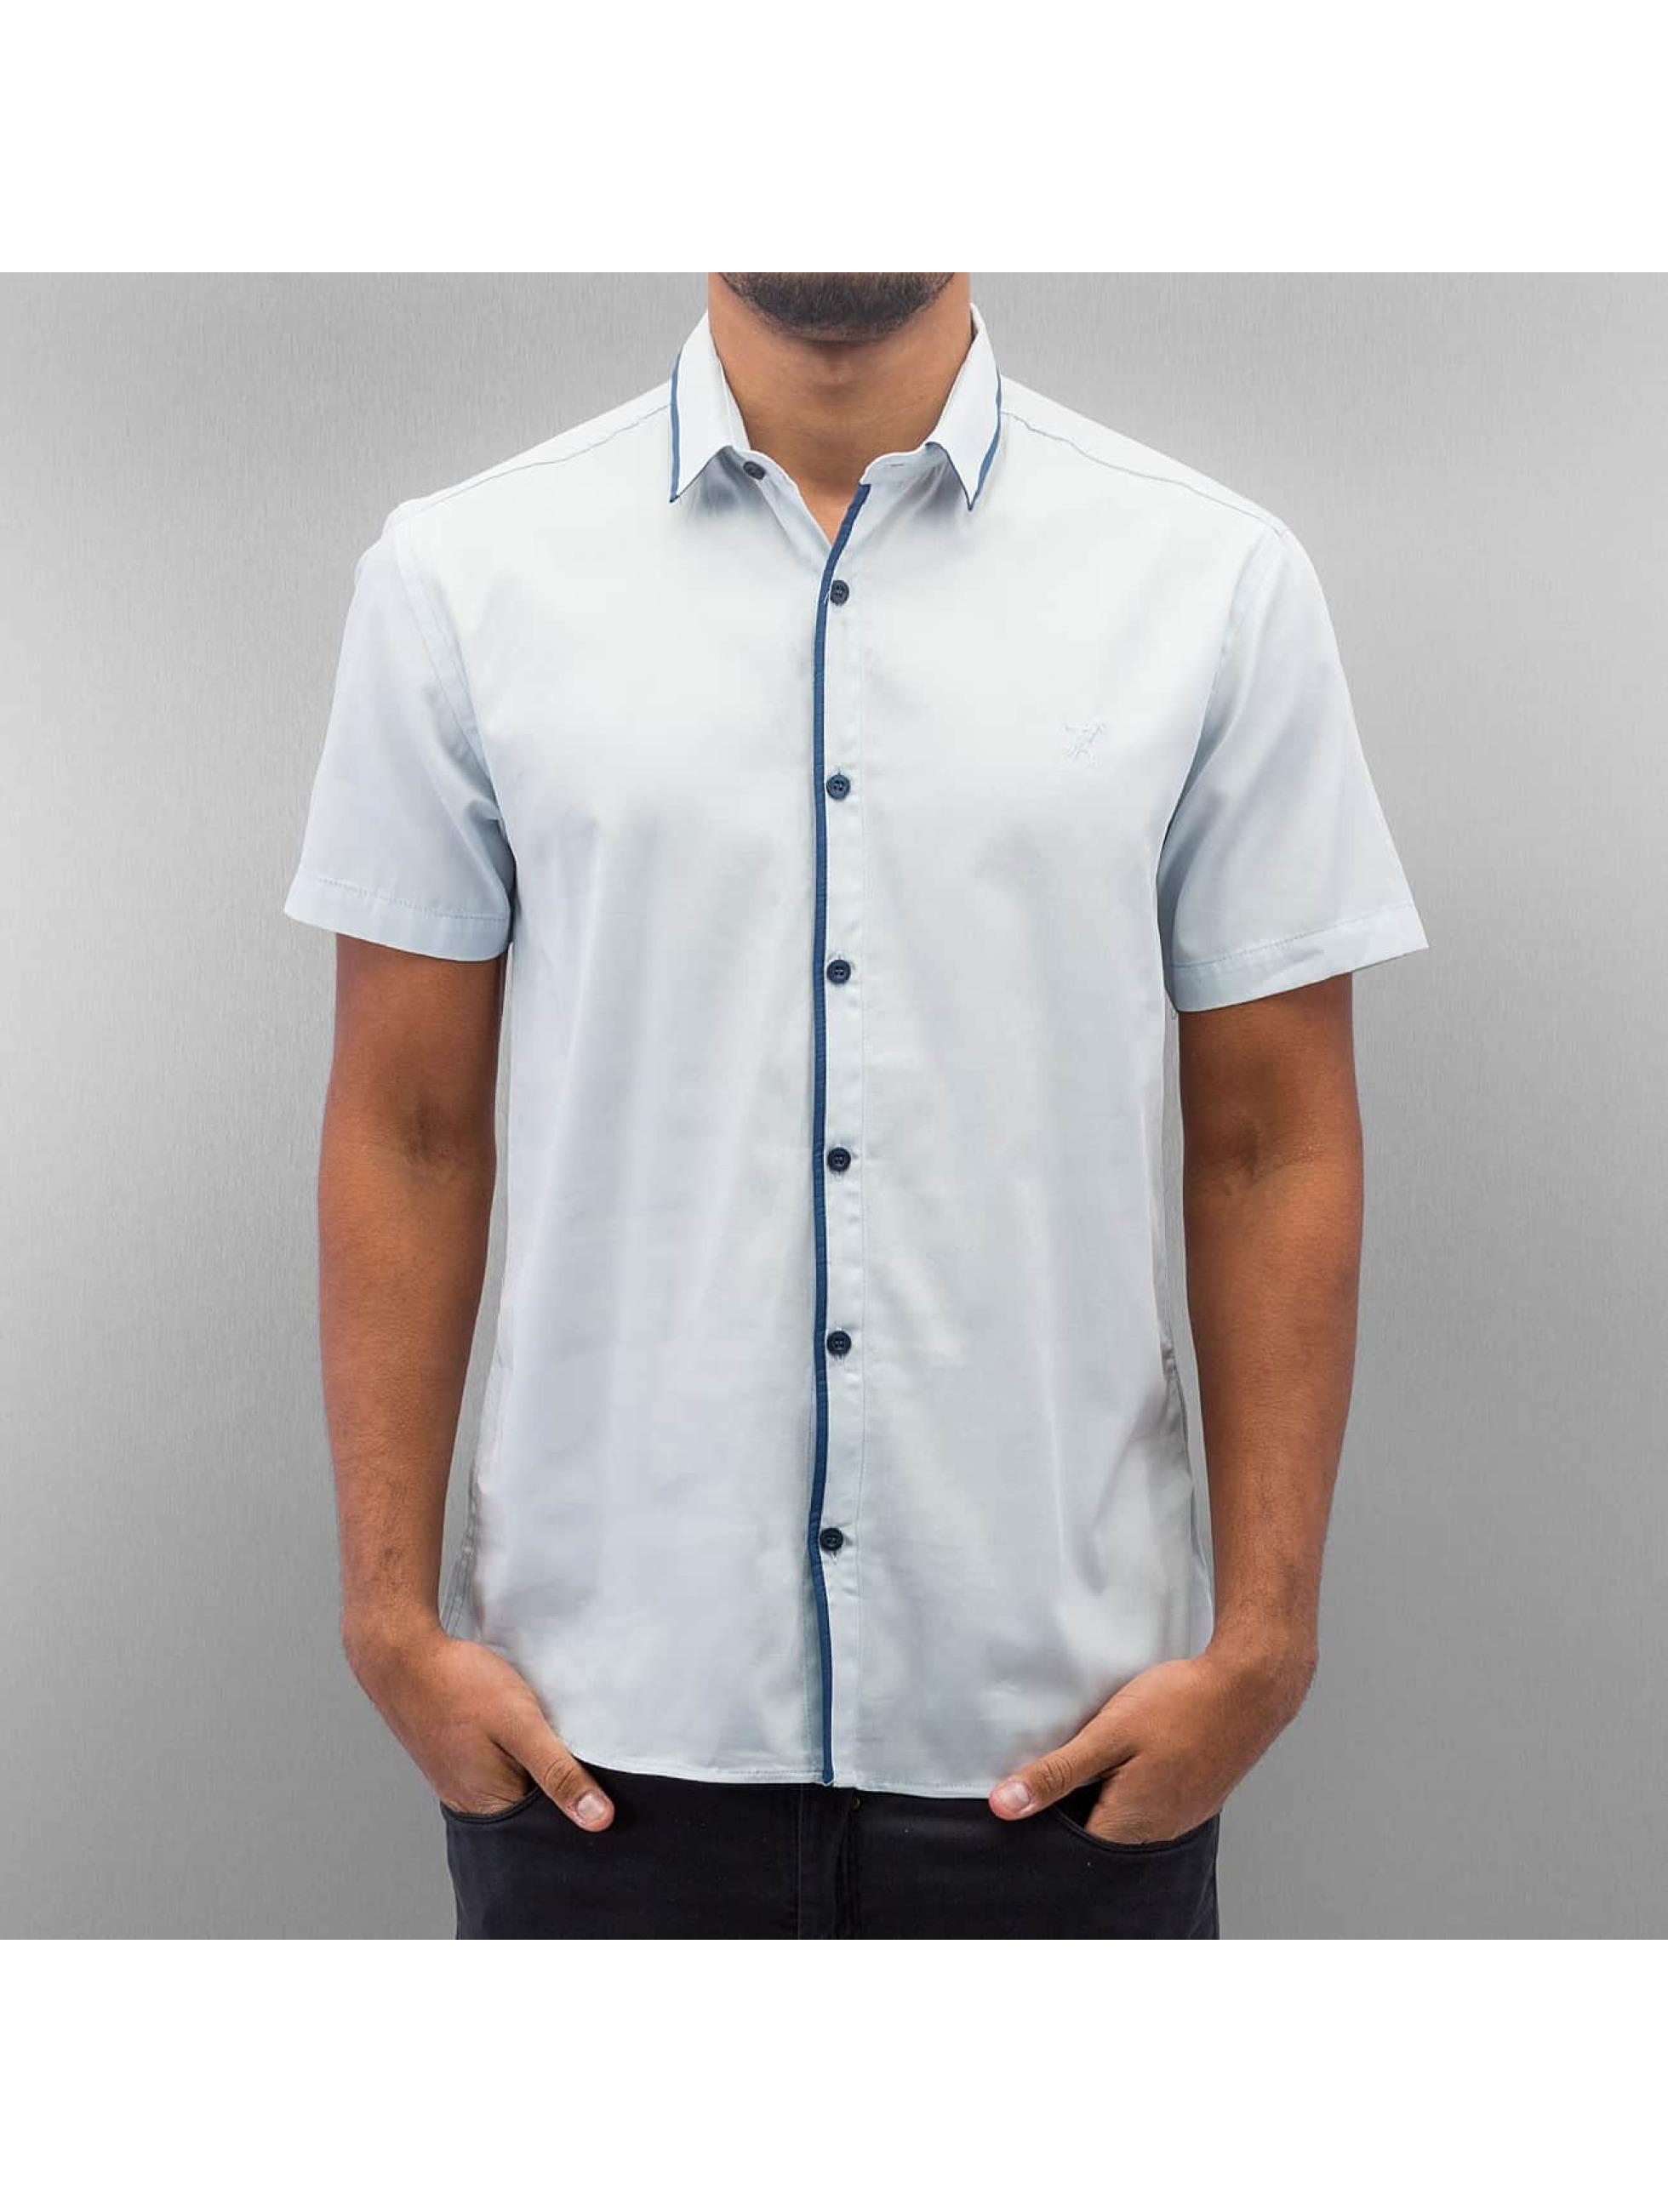 Cazzy Clang Shirt Feim blue